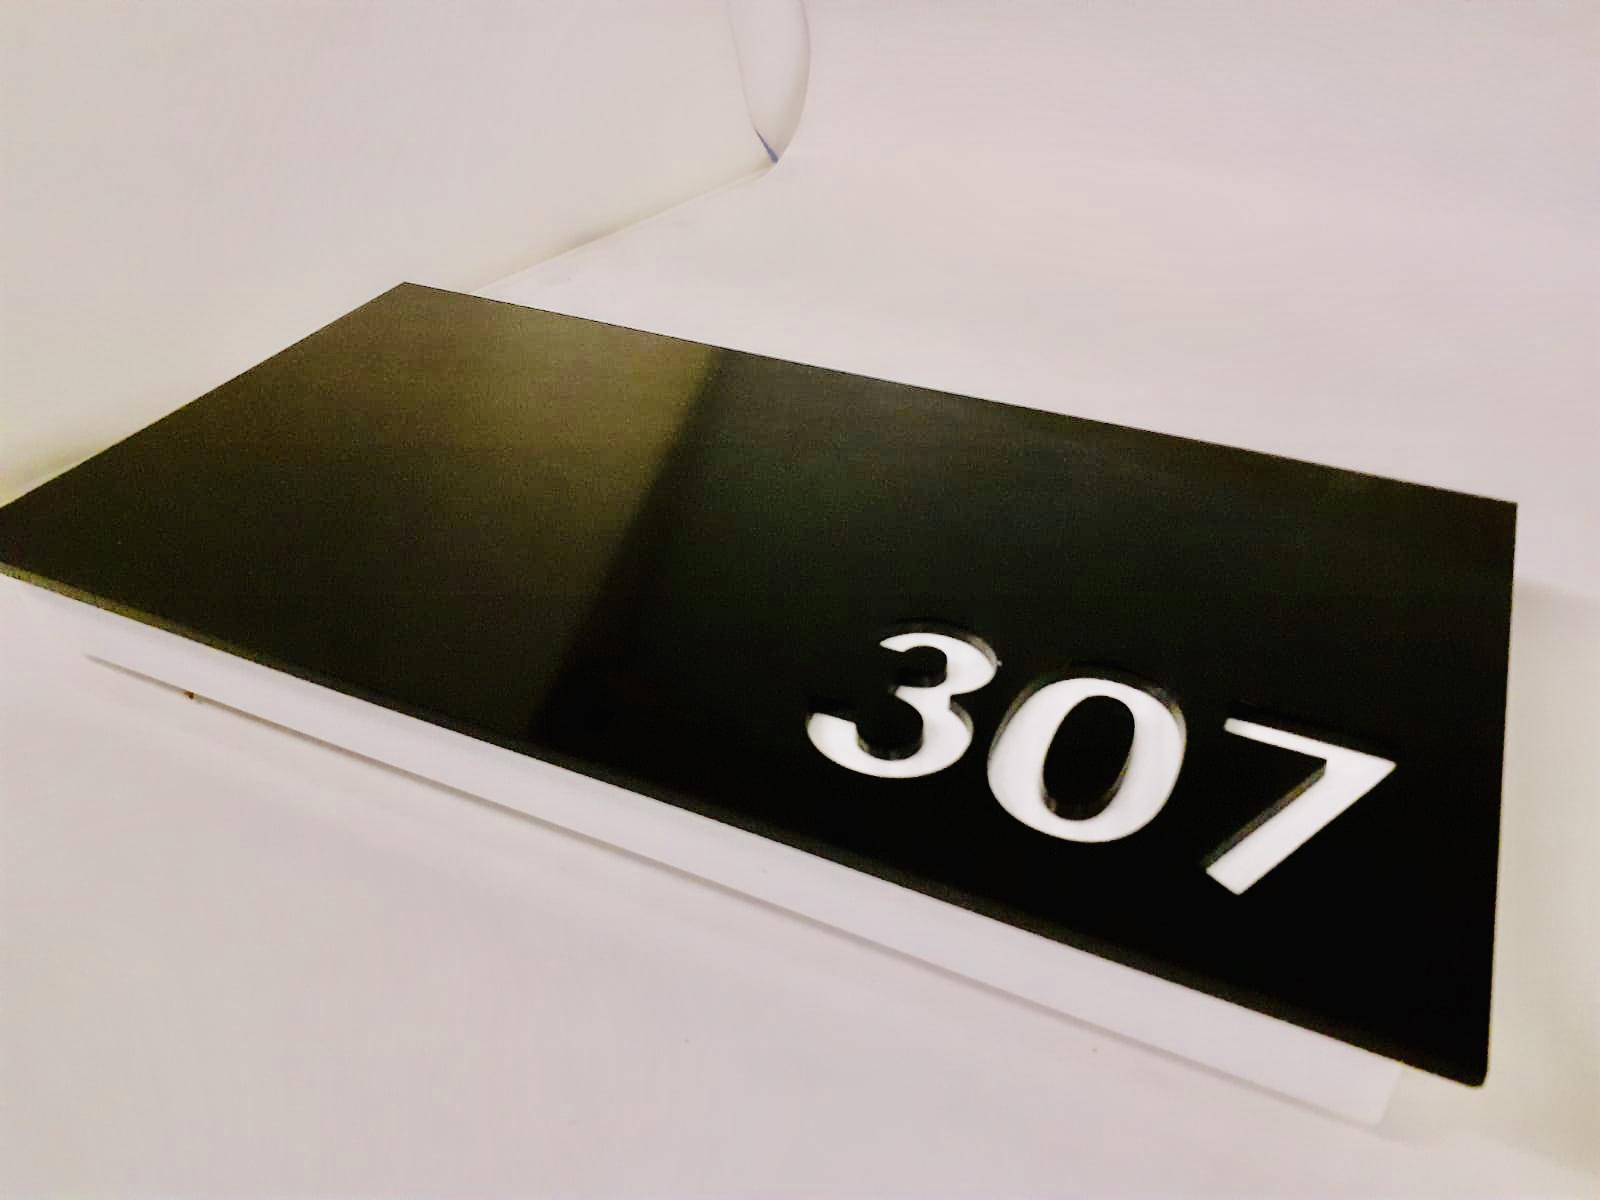 6F236938-57E3-4D4D-92B4-5846AA5D558B